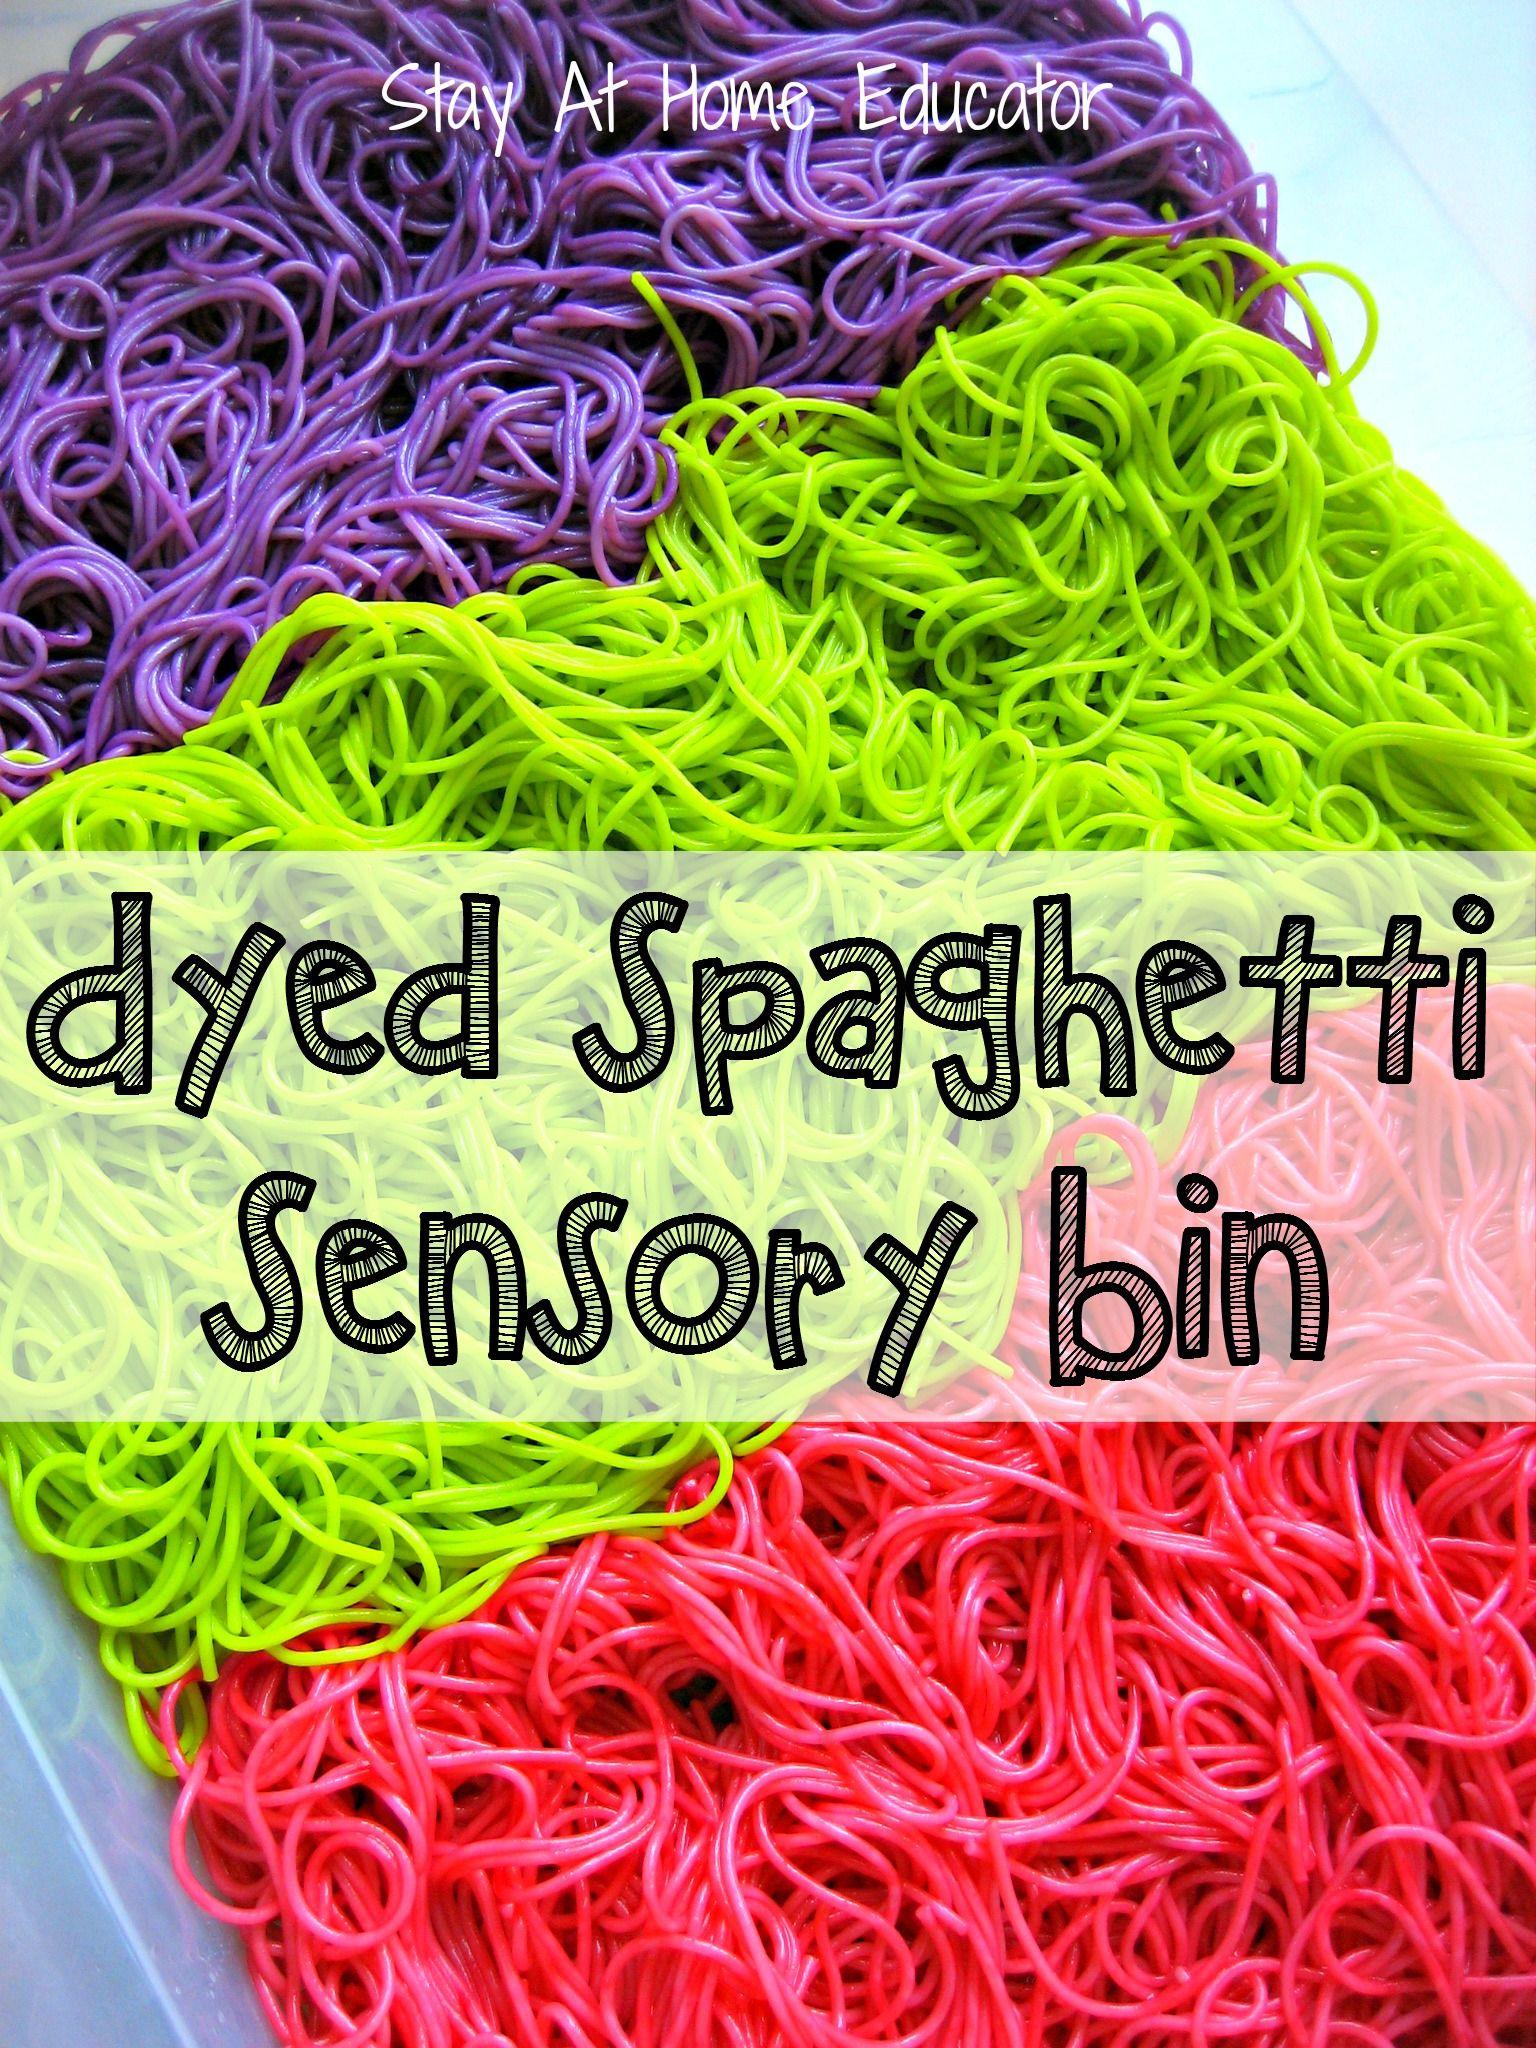 Dyed Spaghetti Sensory Bin Sensory Play Plays And Learning